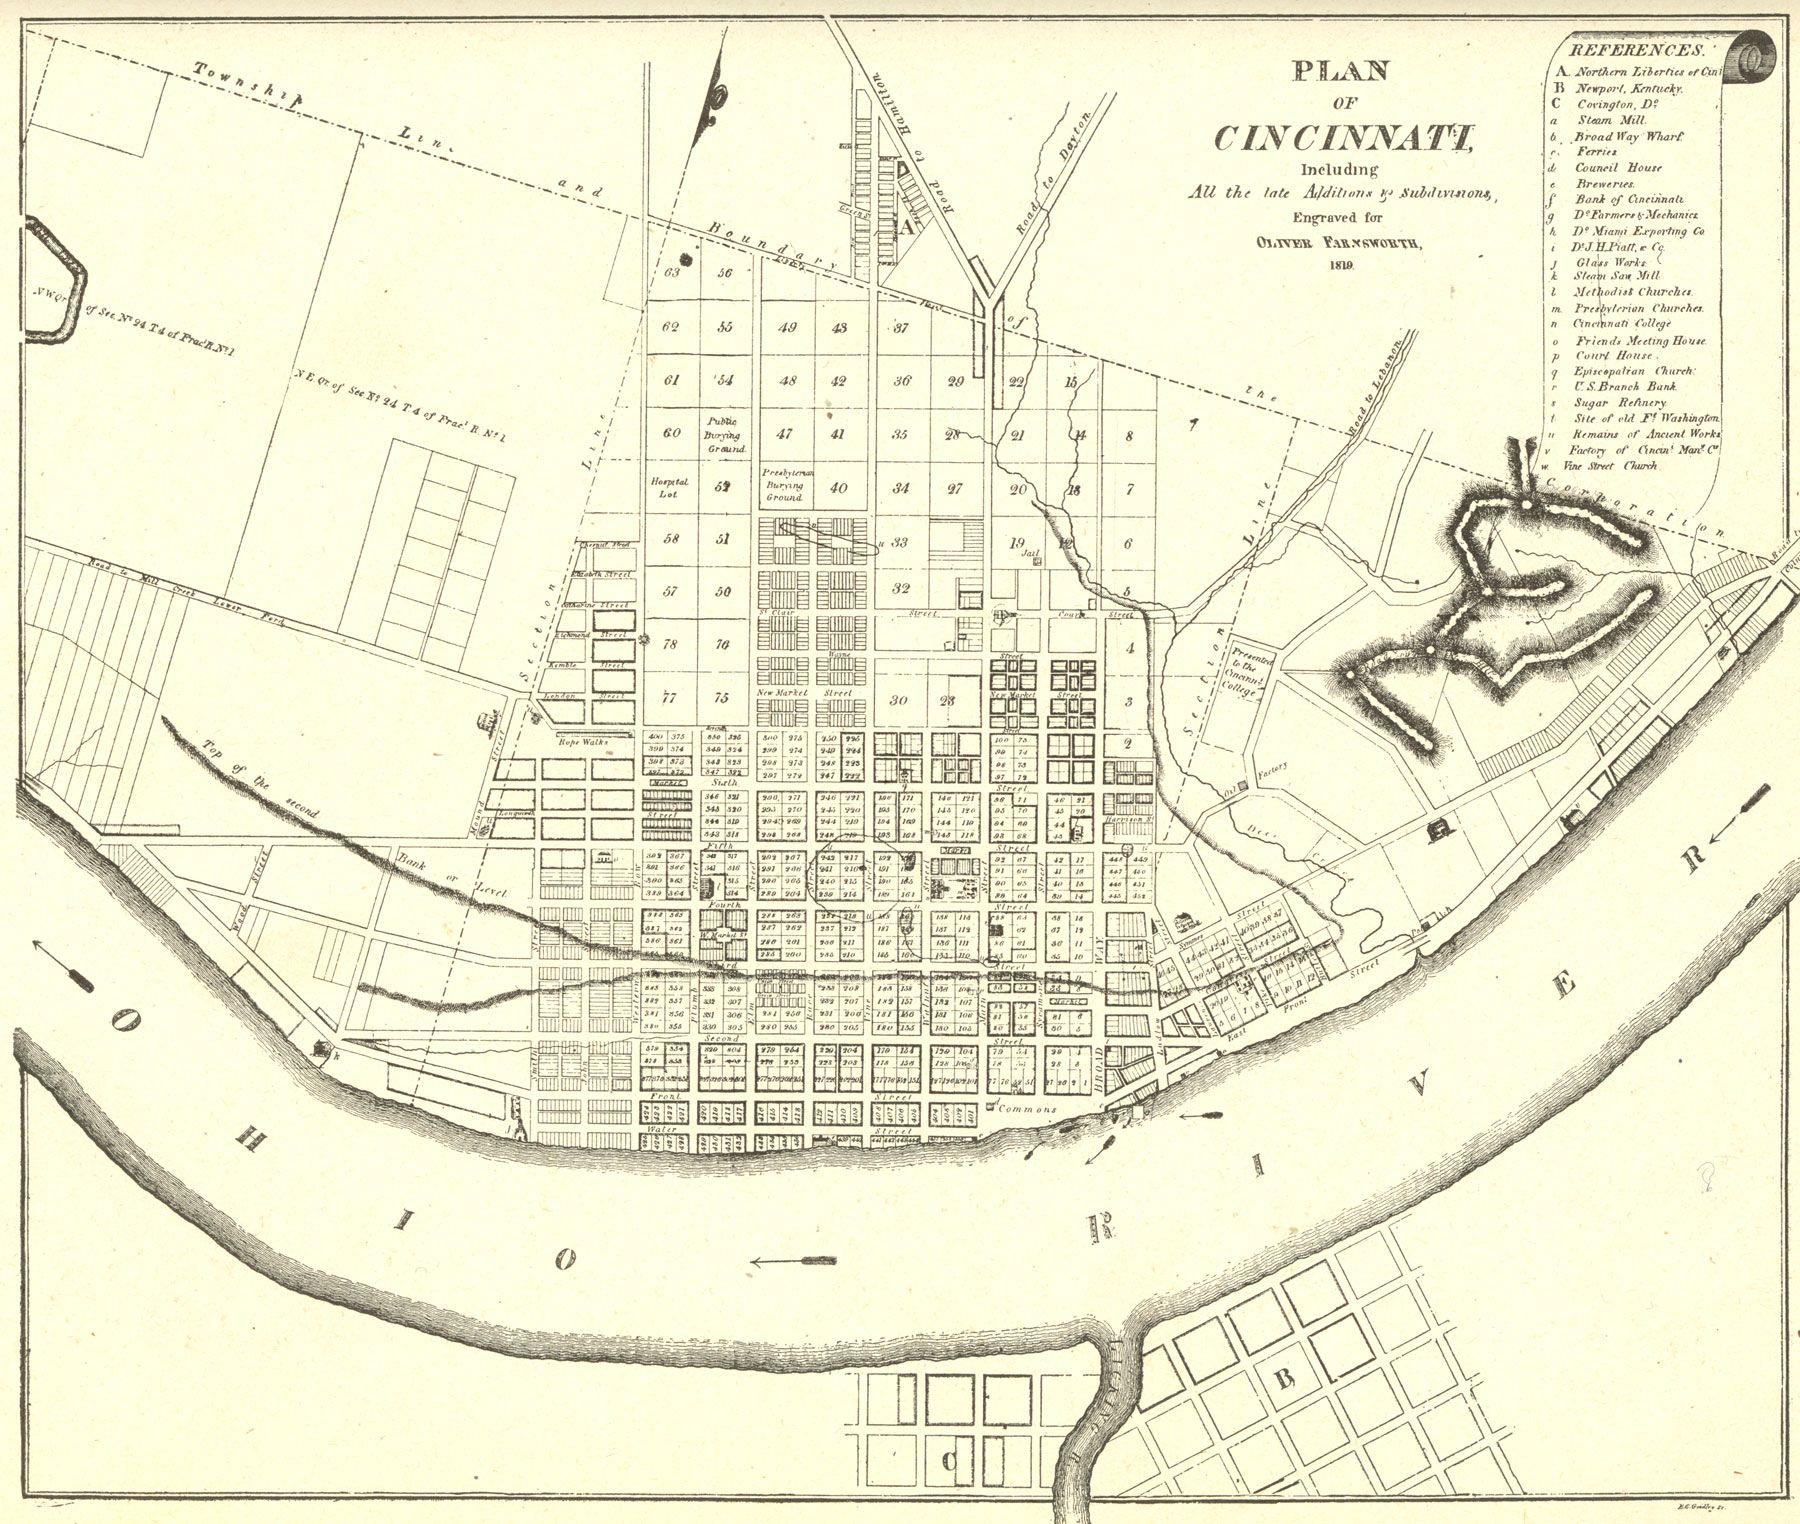 1819 The Year Cincinnati Became The City Of Cincinnati